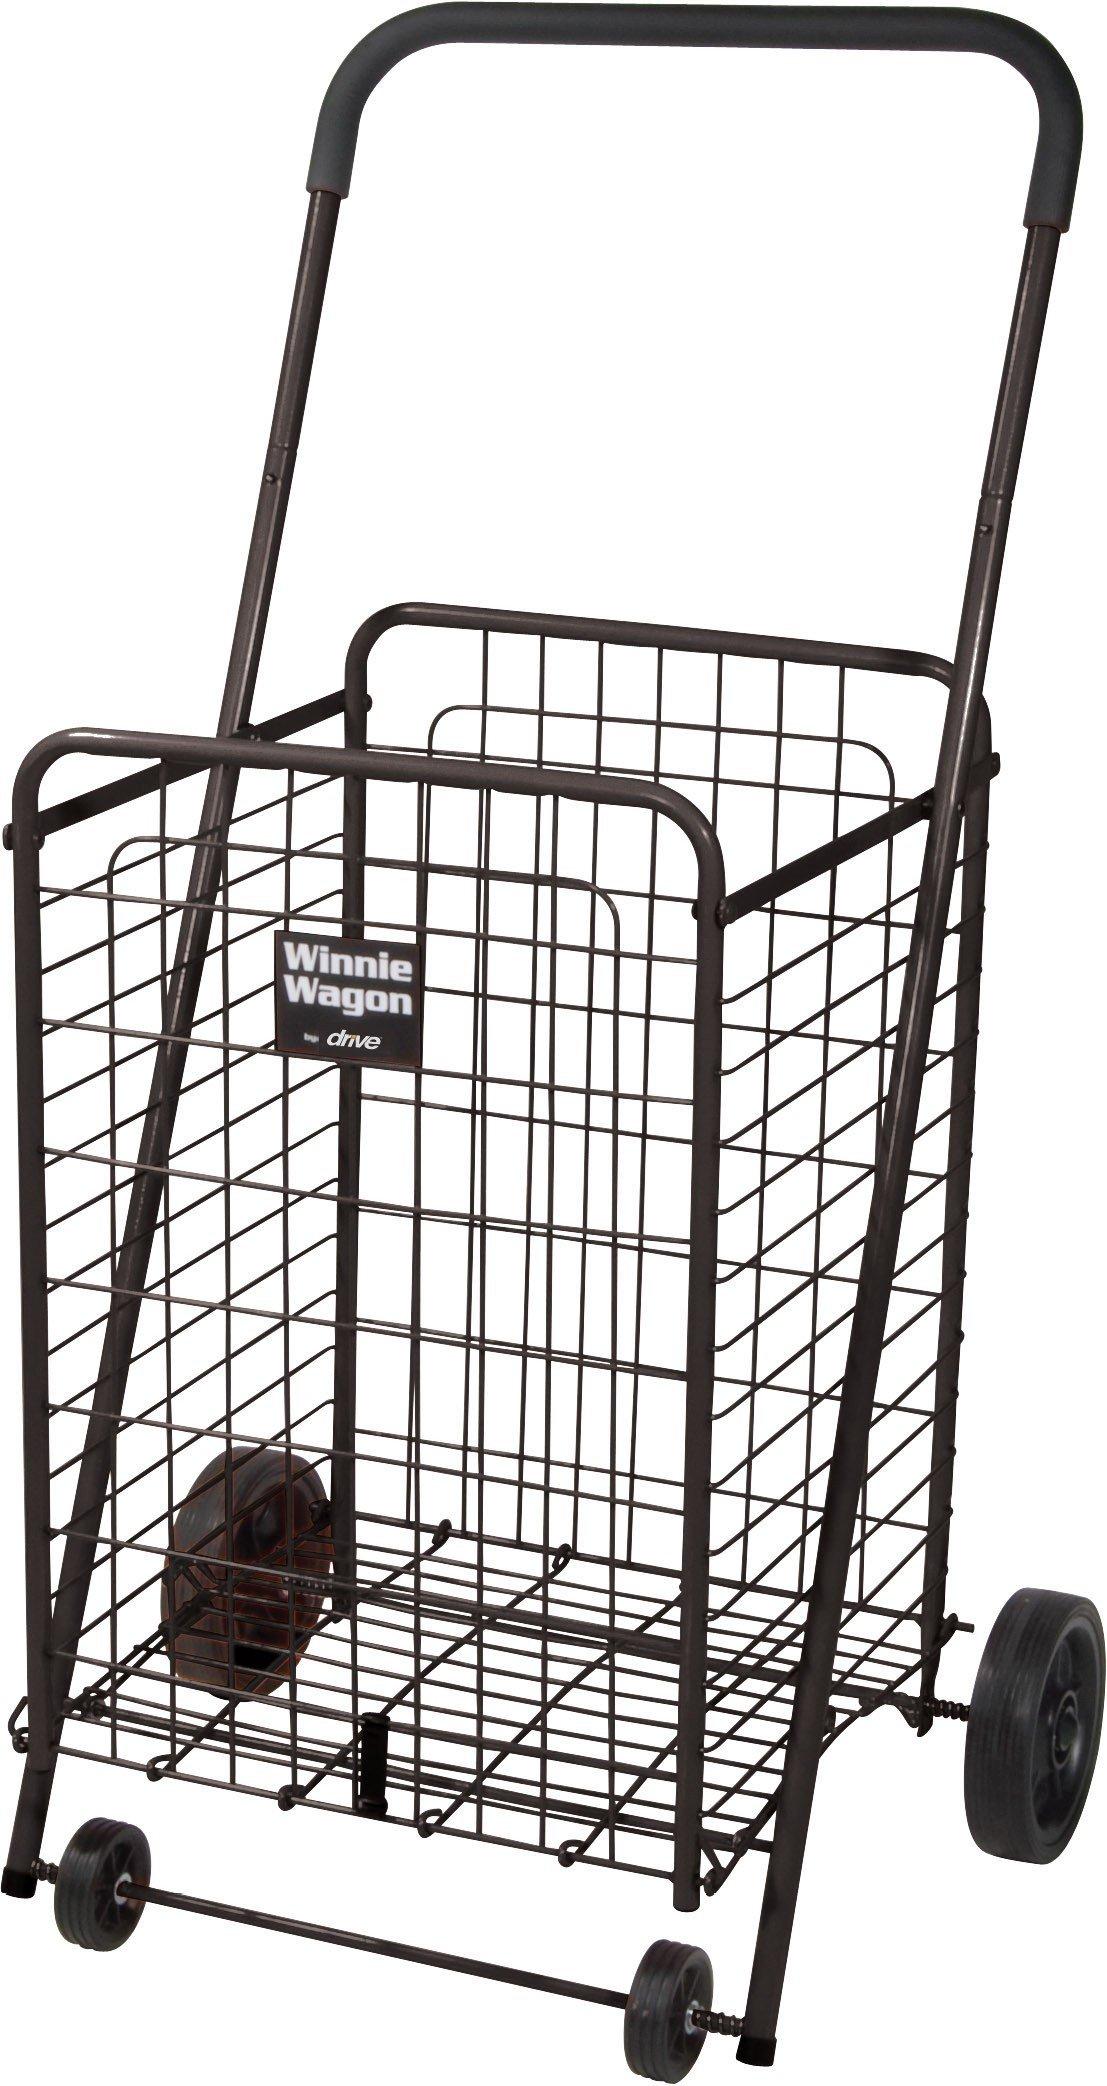 Winnie Wagon with Adjustable Height Handle - Black